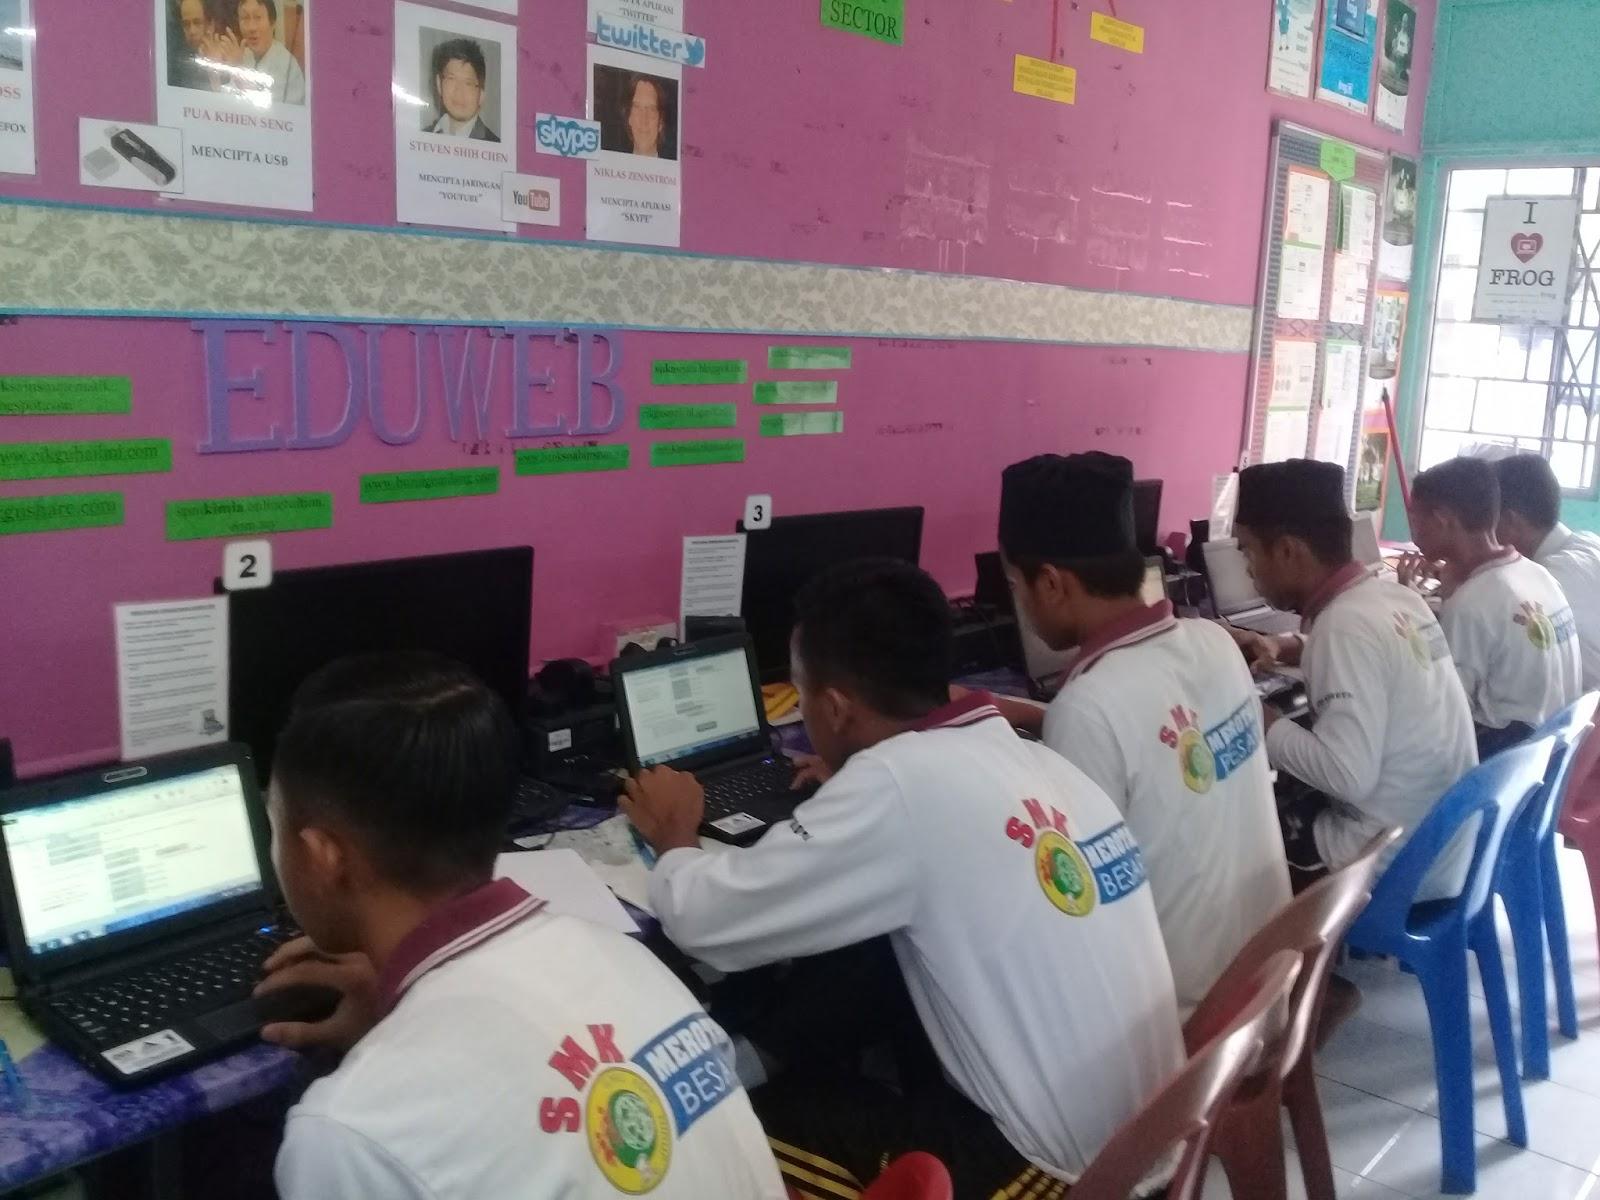 Ujian Pentaksiran Kompetensi Literasi Sains Matematik Dan Bacaan Pklsmb 2017 Smk Merotai Besar